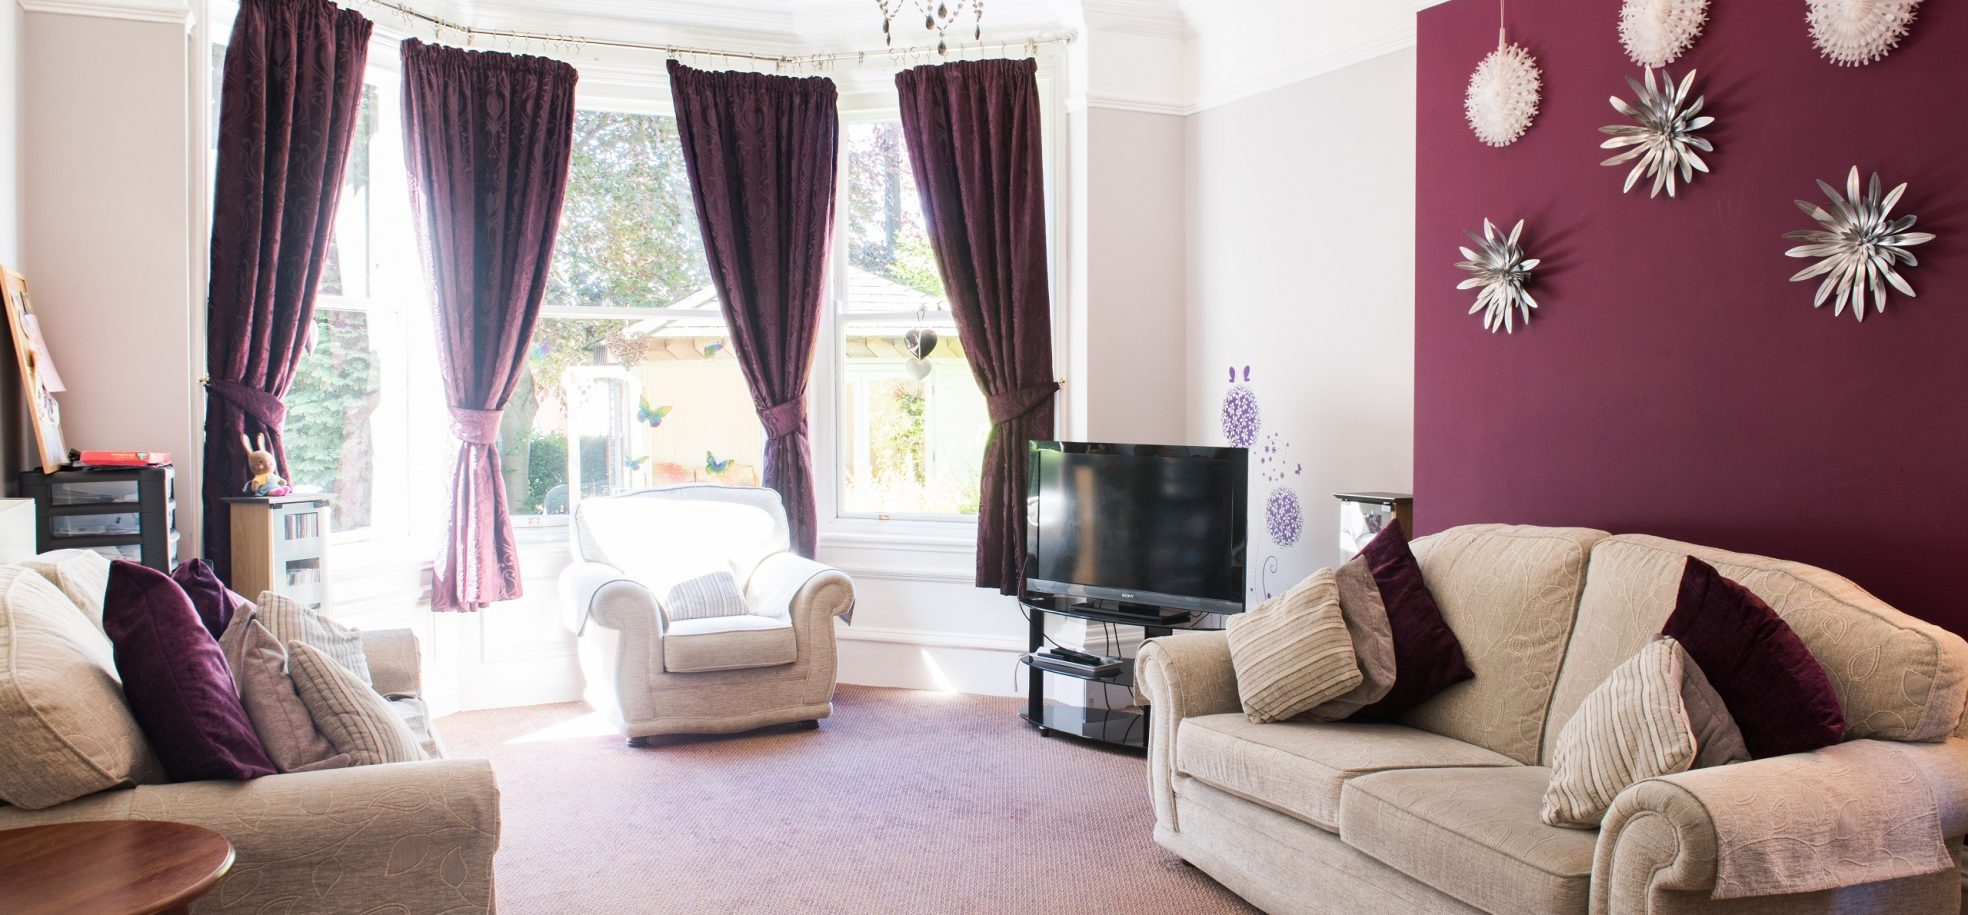 Harry Priestley House lounge area